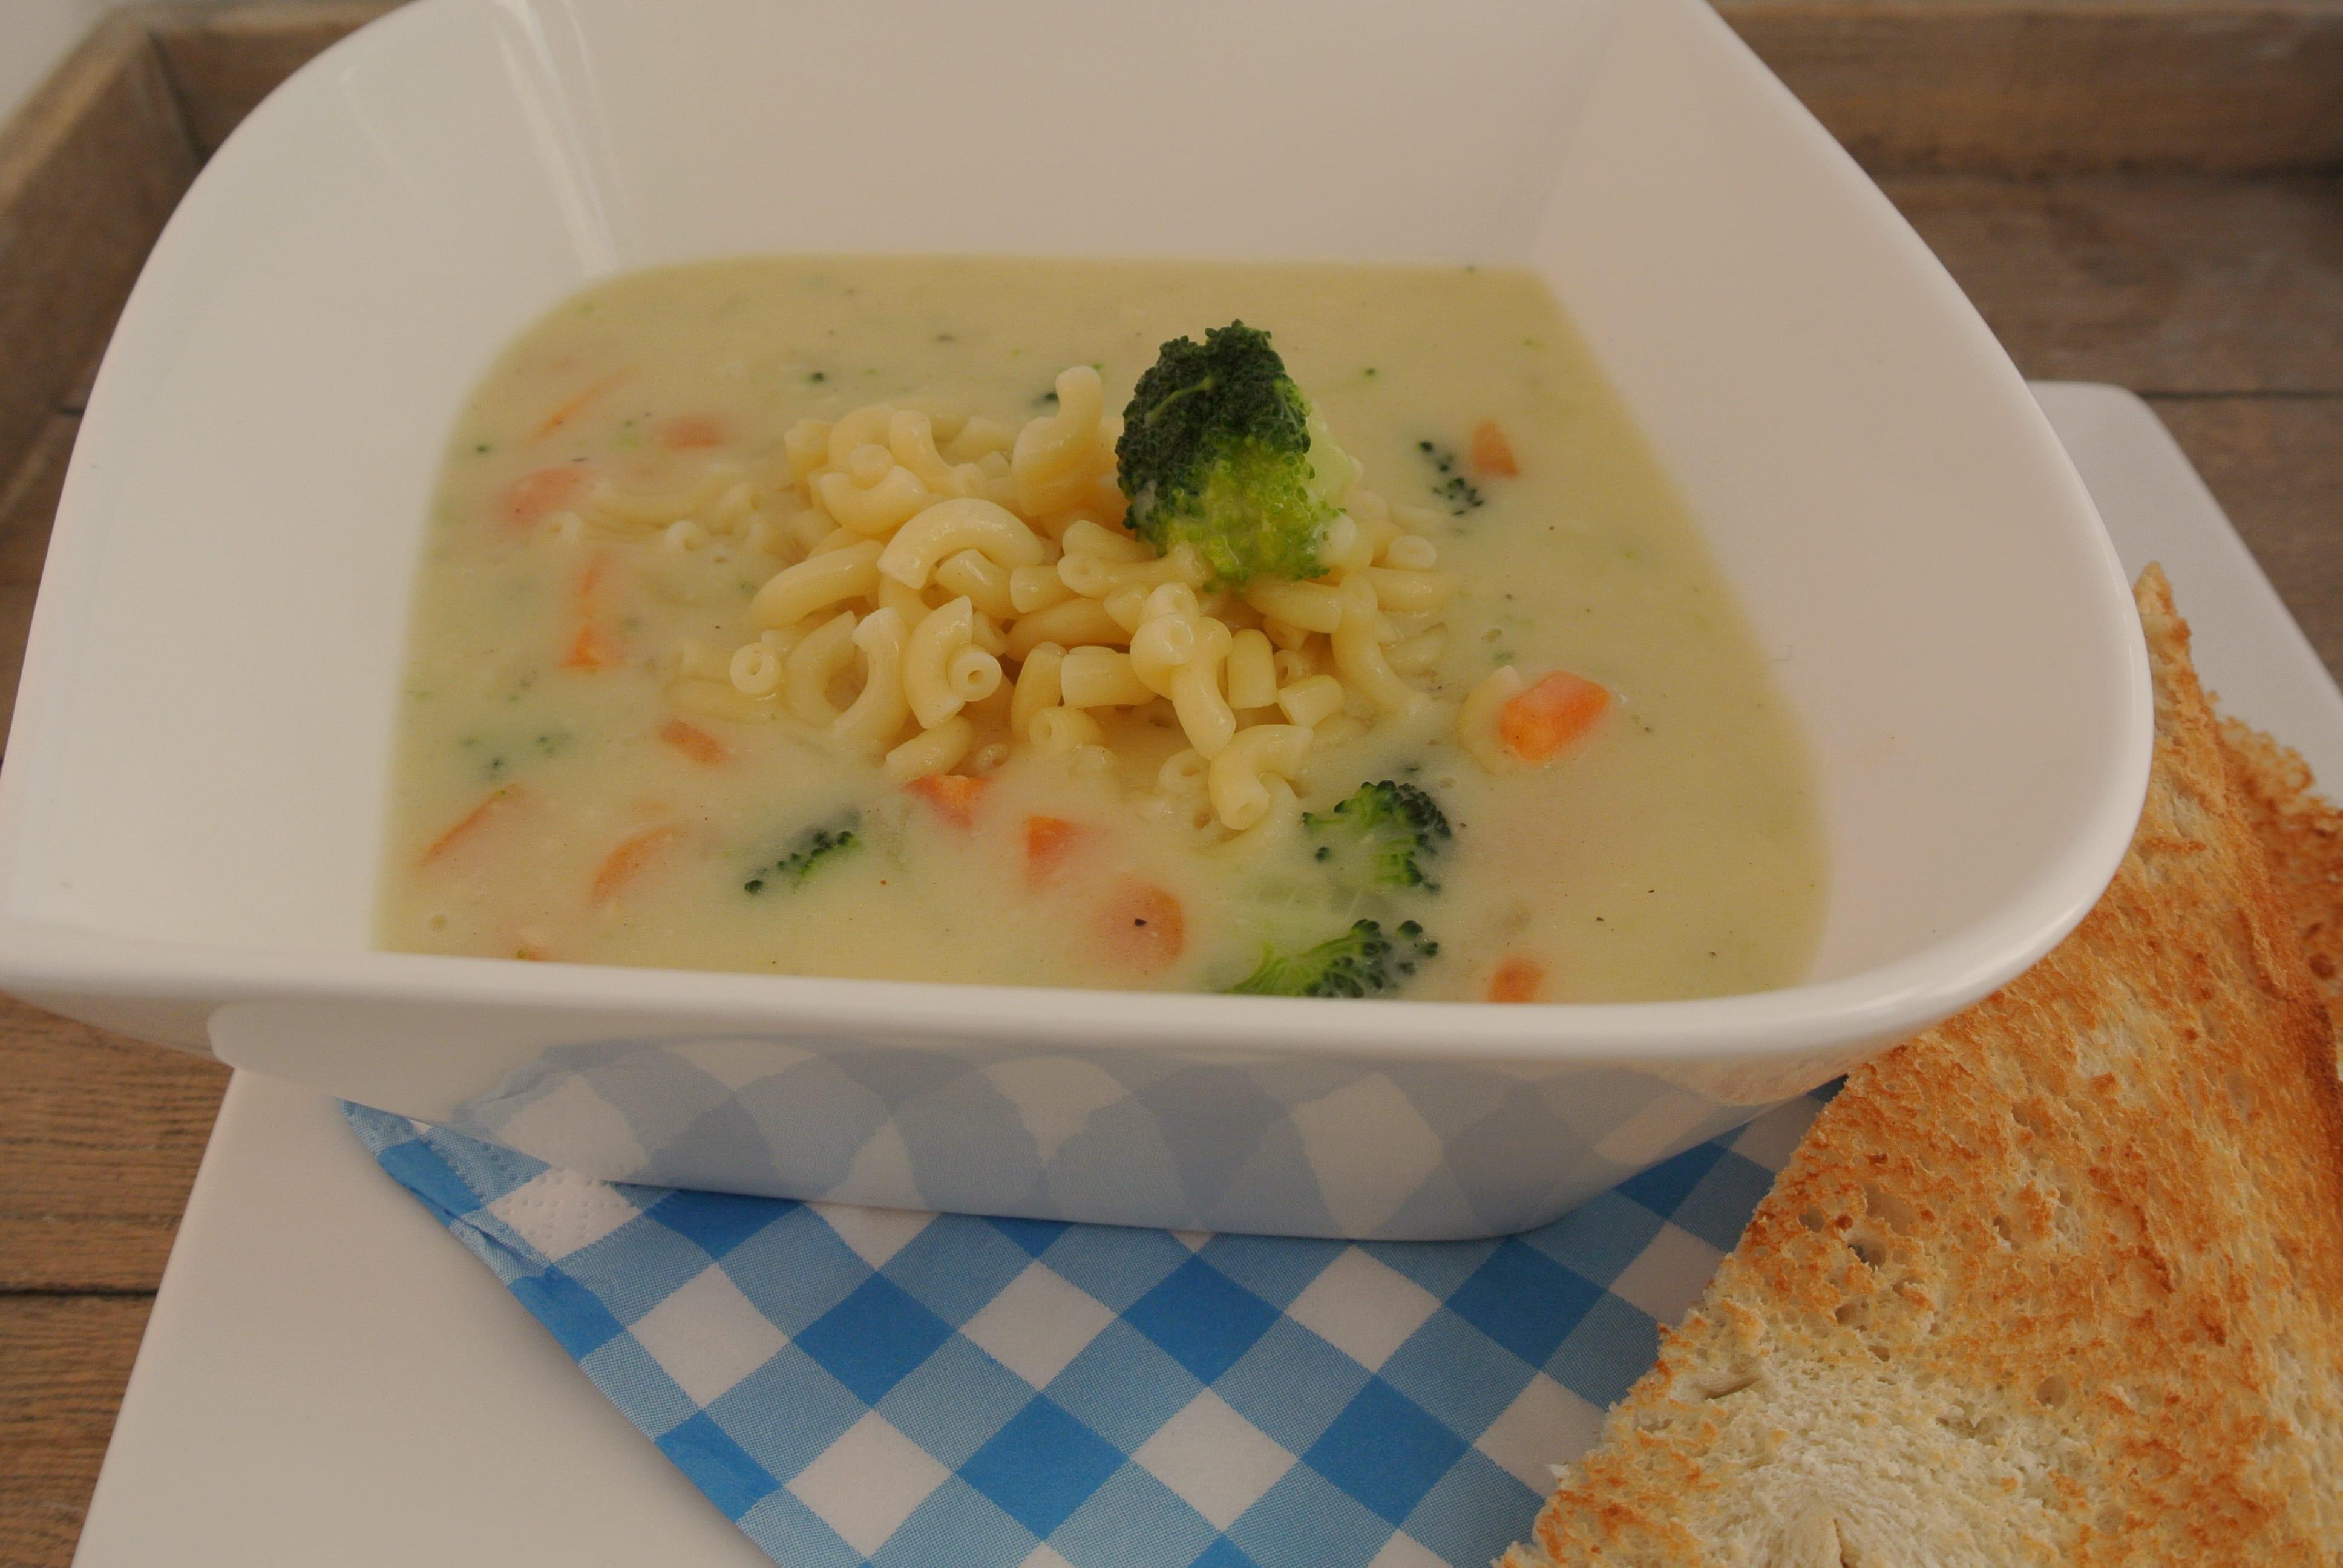 Heerlijke macaroni-soep met broccoli